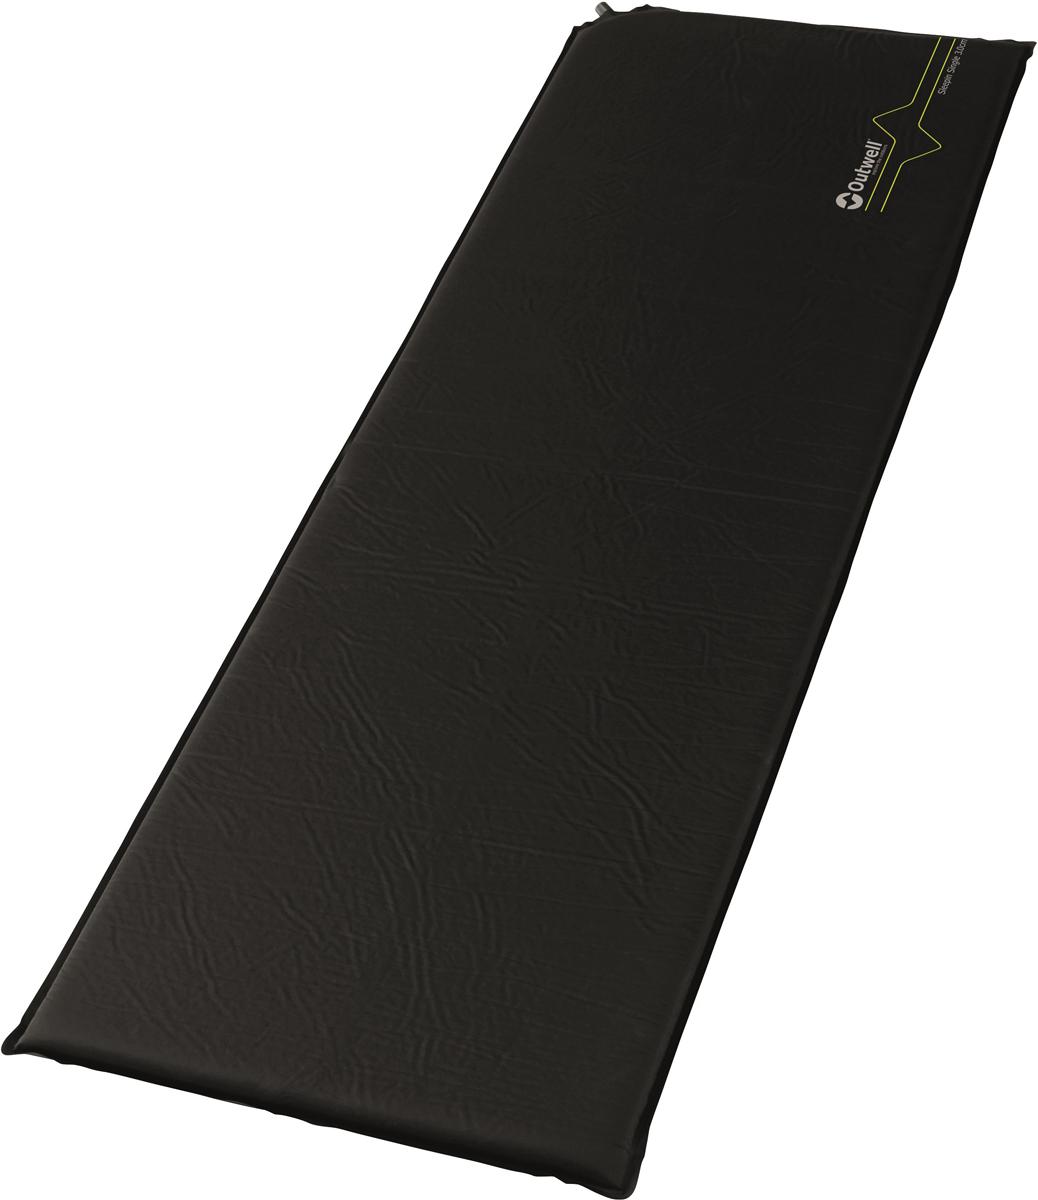 Коврик самонадувающийся Outwell Sleepin Single, 183 х 51 х 3 см